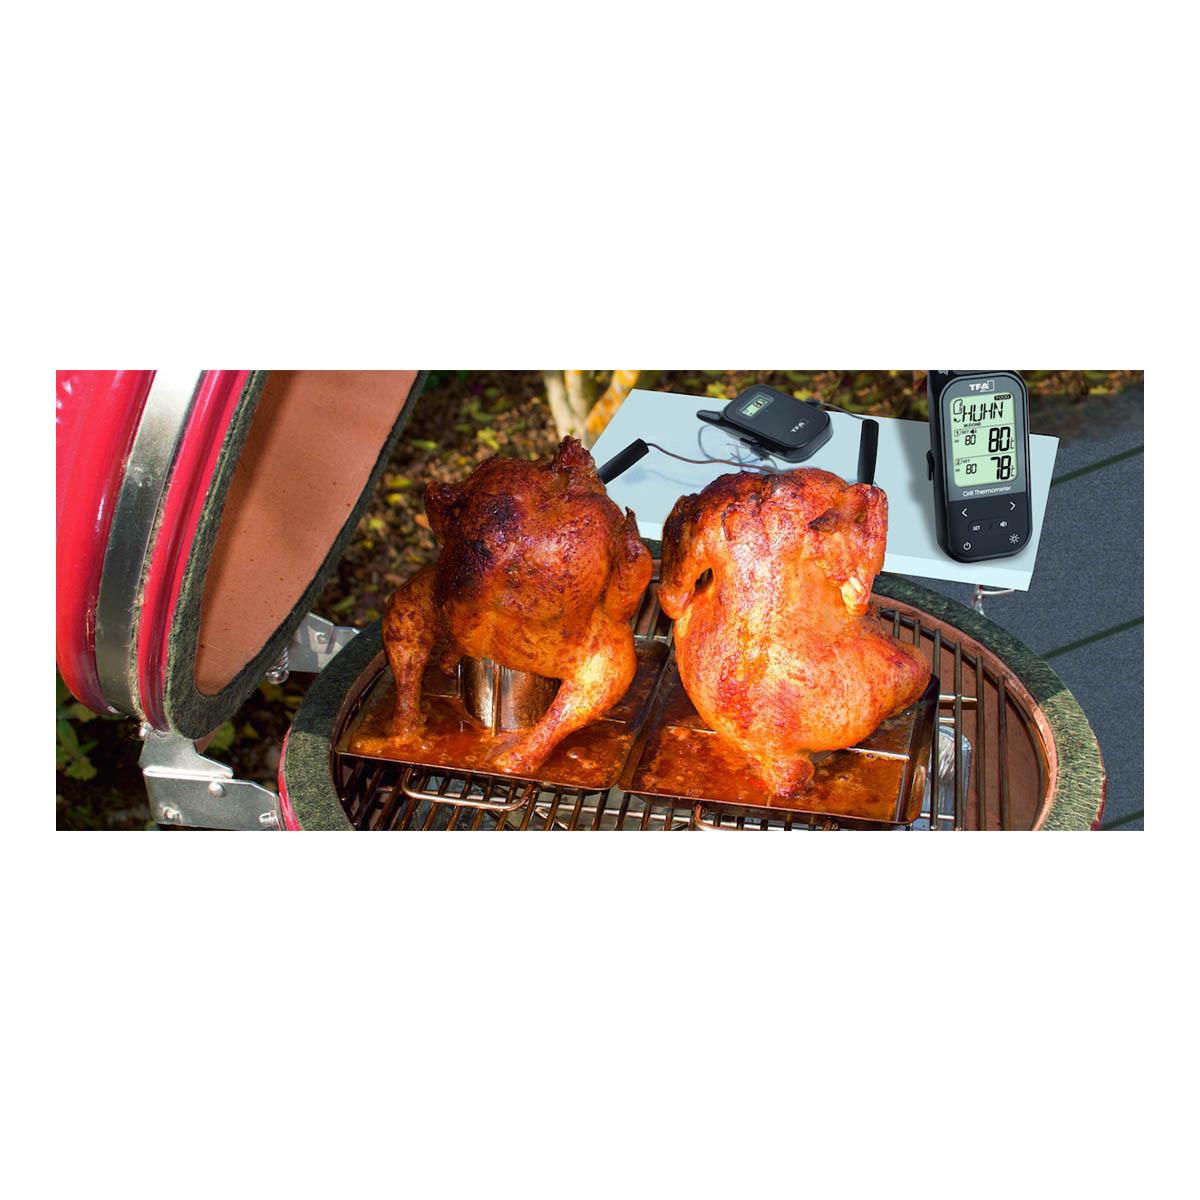 14-1511-01-funk-grill-braten-ofenthermometer-küchen-chef-twin-anwendung1-1200x1200px.jpg